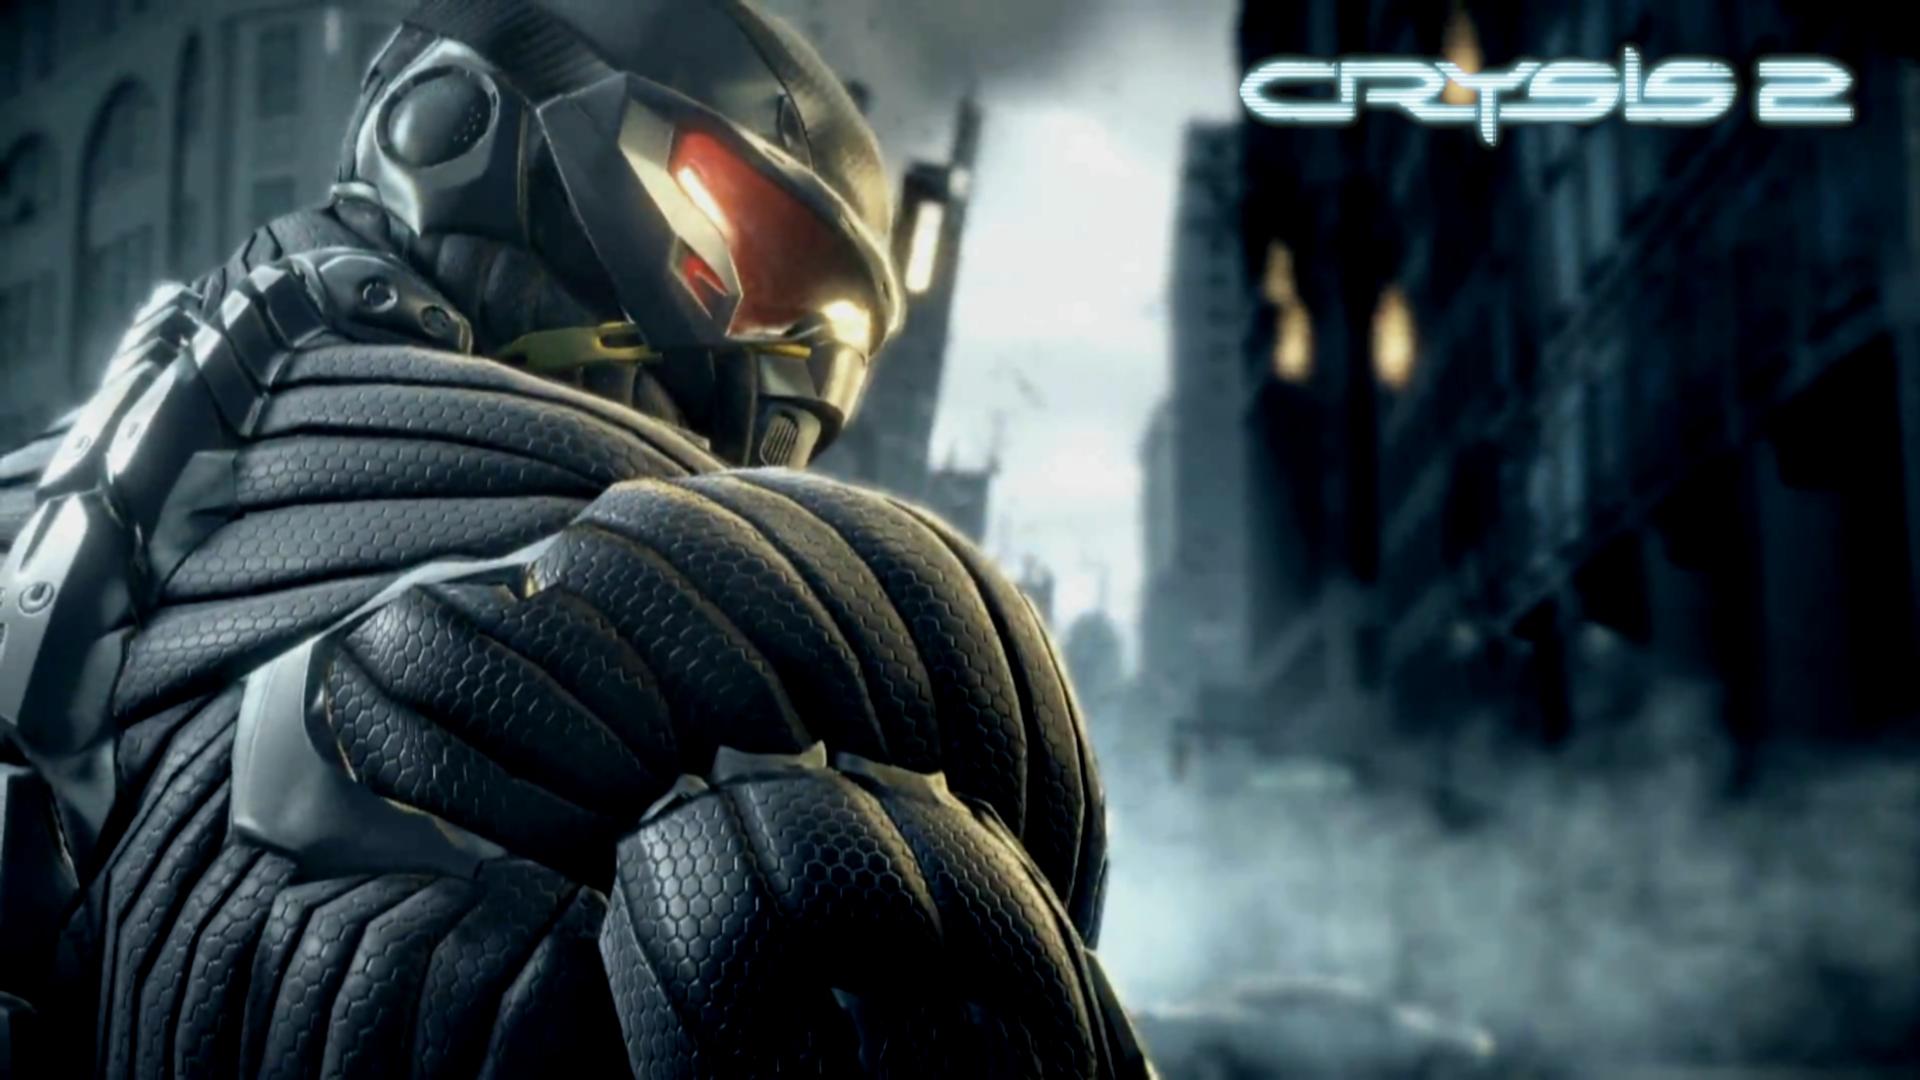 crysis 2 wallpaper - UK Verkaufscharts: Crysis 2 stürzt Homefront vom Thron